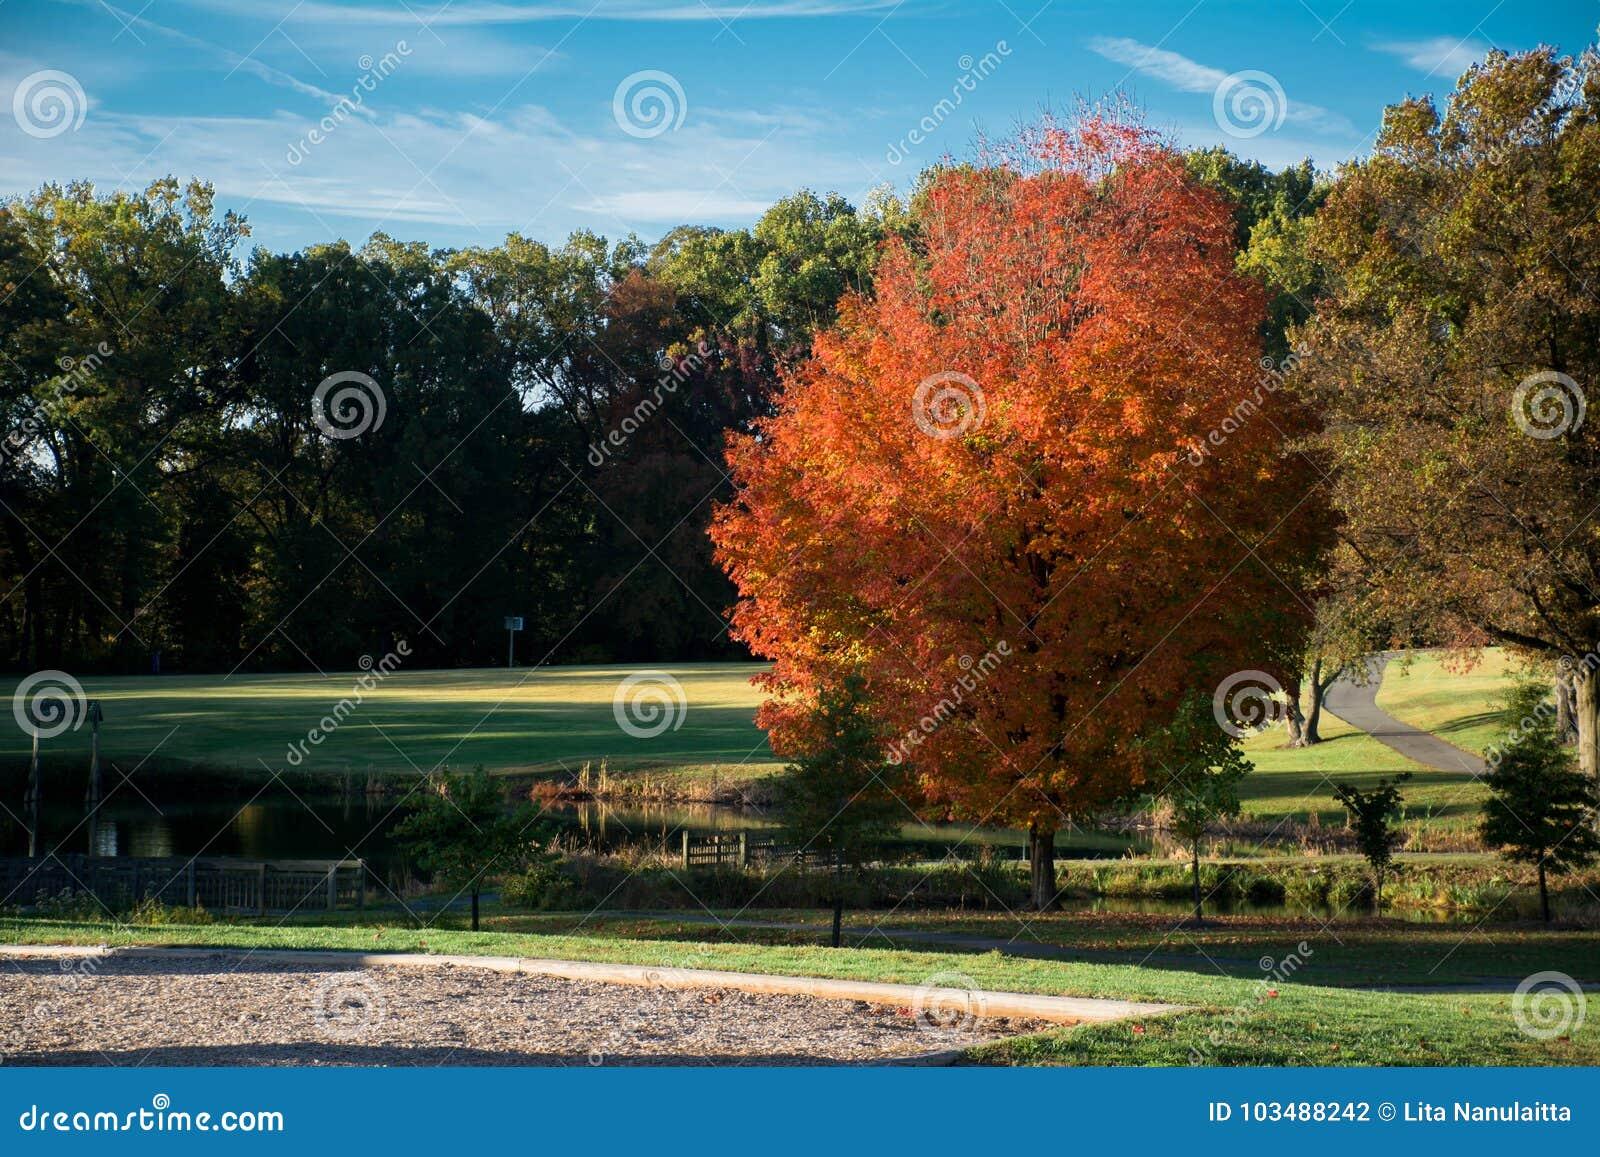 Bel Autumn Seasons, ciel bleu, froid et brise dehors